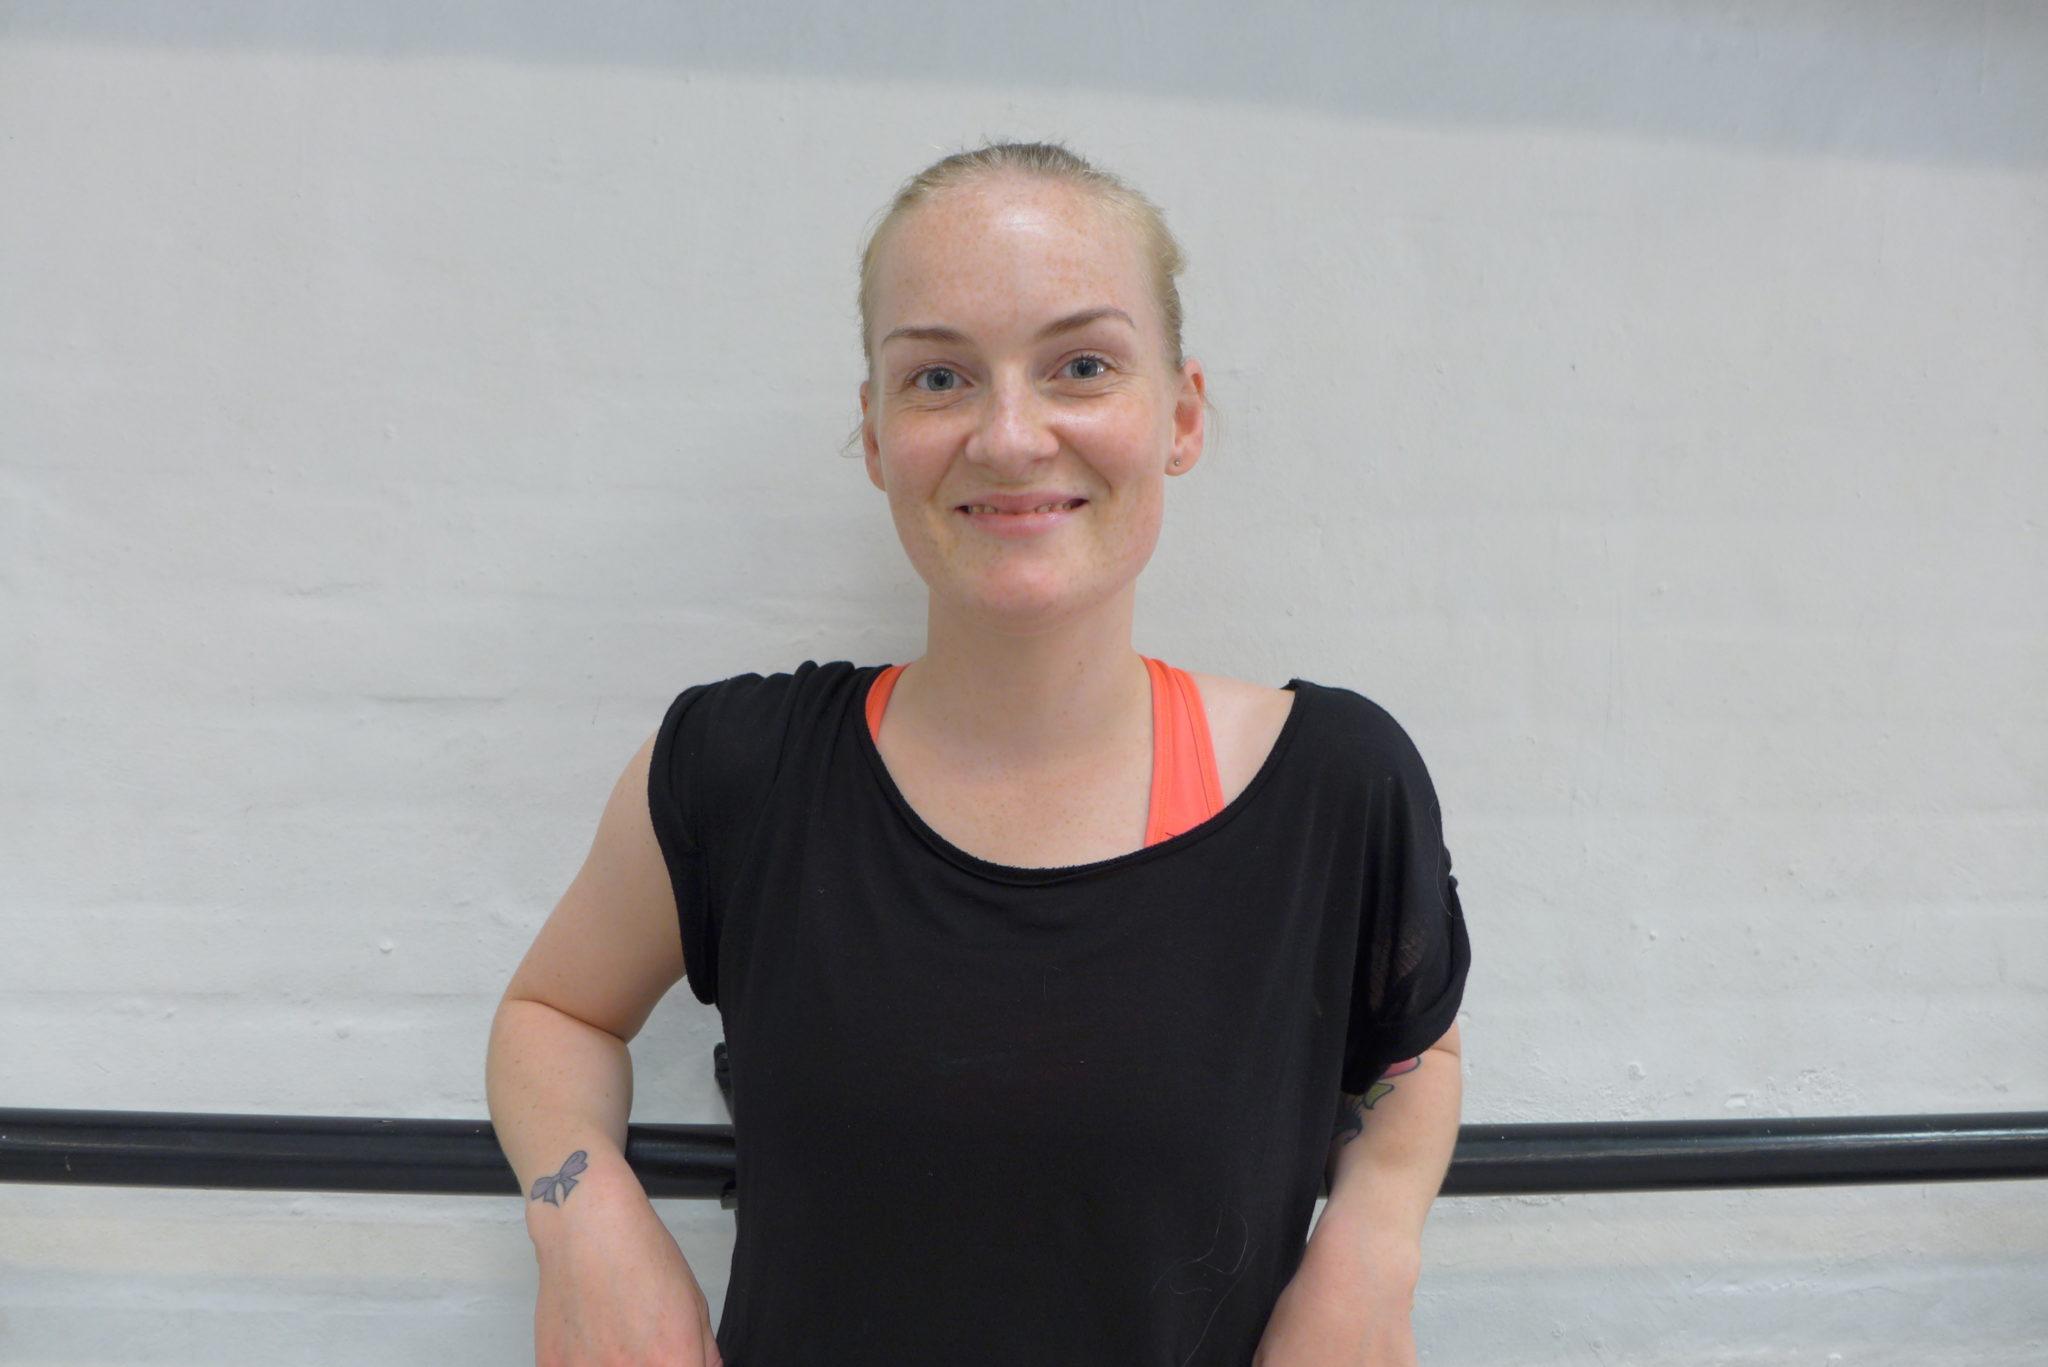 Nana Emilie Kjærgaard